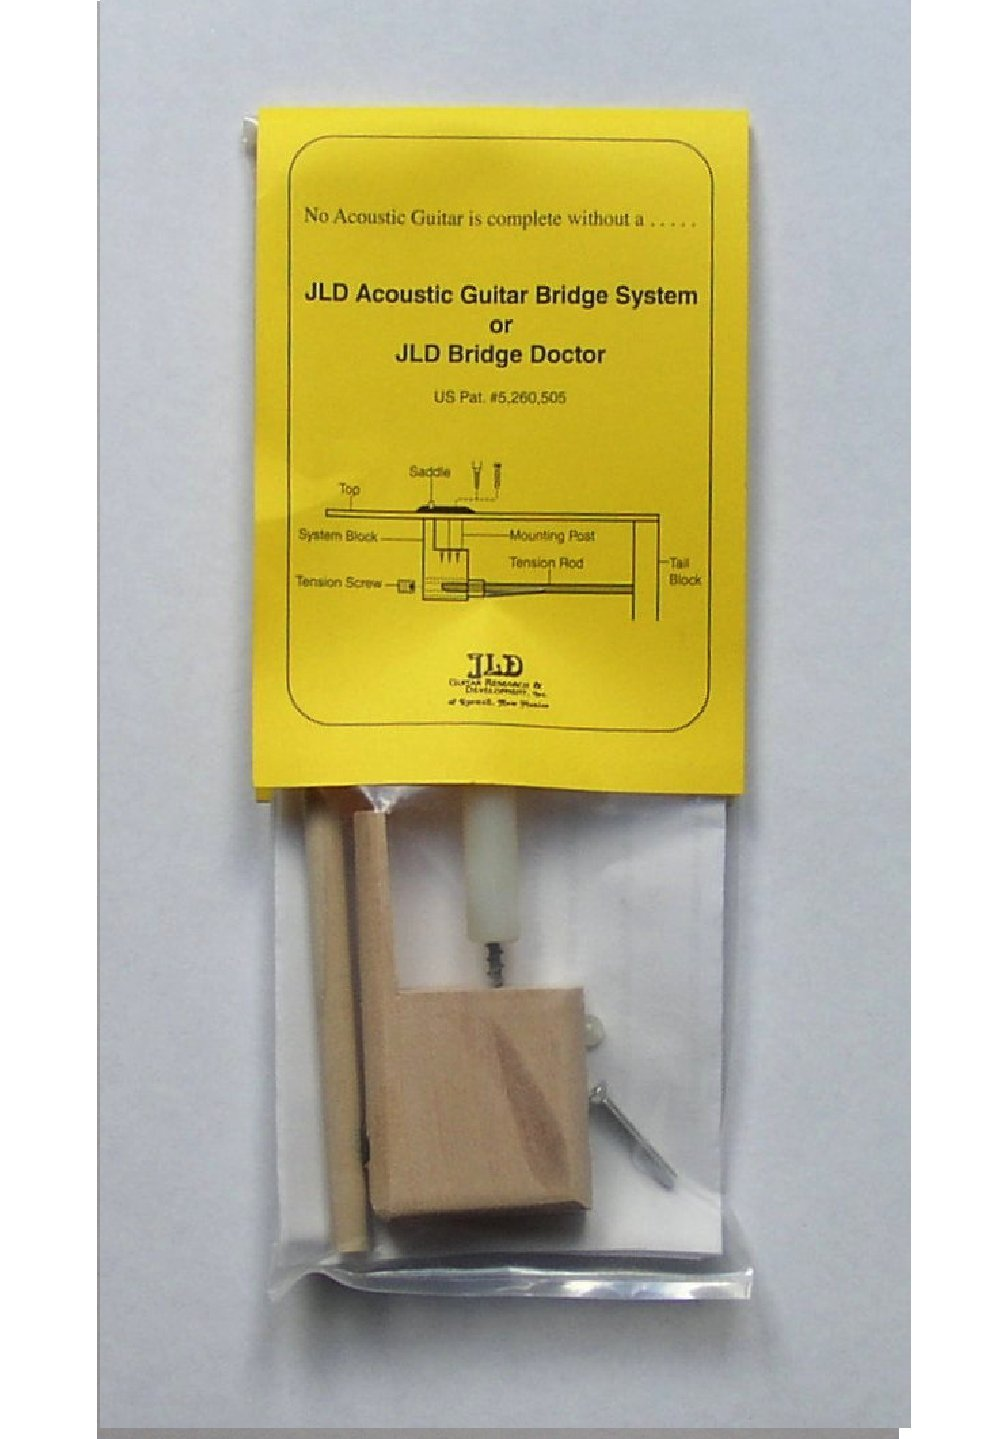 JLD Bridge Doctor Screw Mount JLD Guitar Research & Development #AN3694